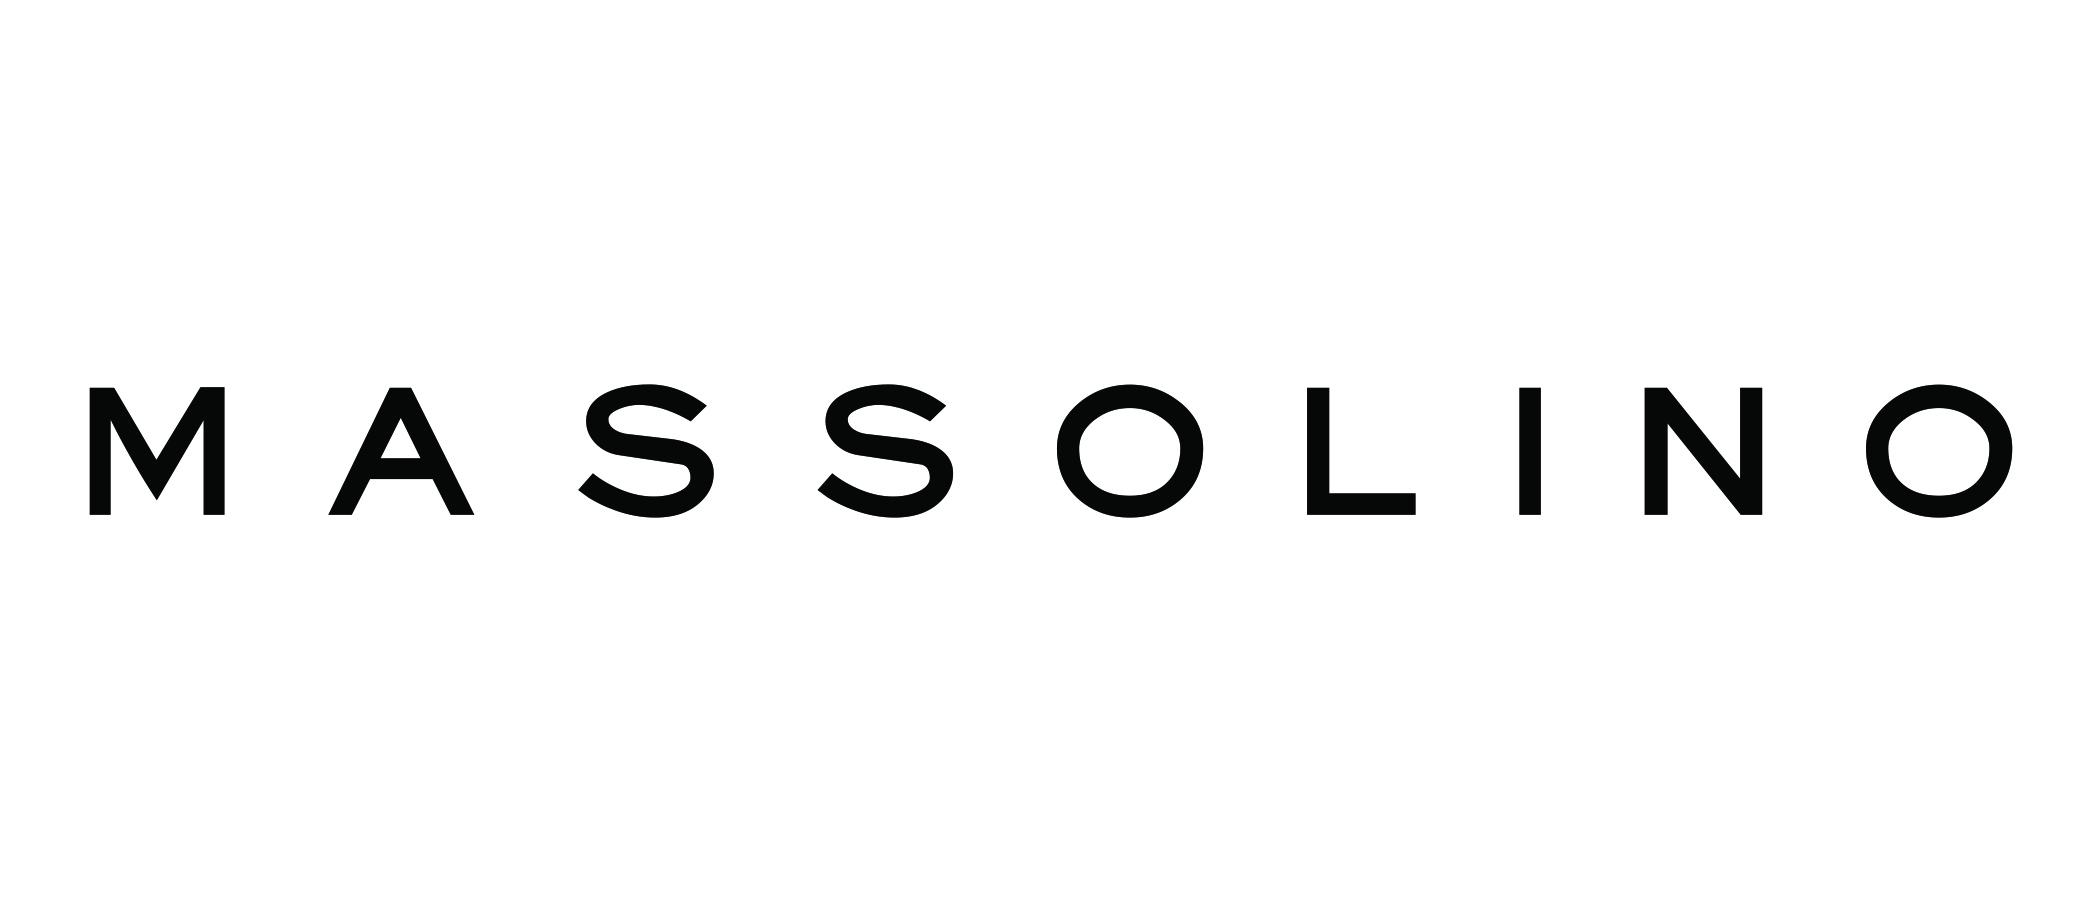 Massolino Logo.jpg